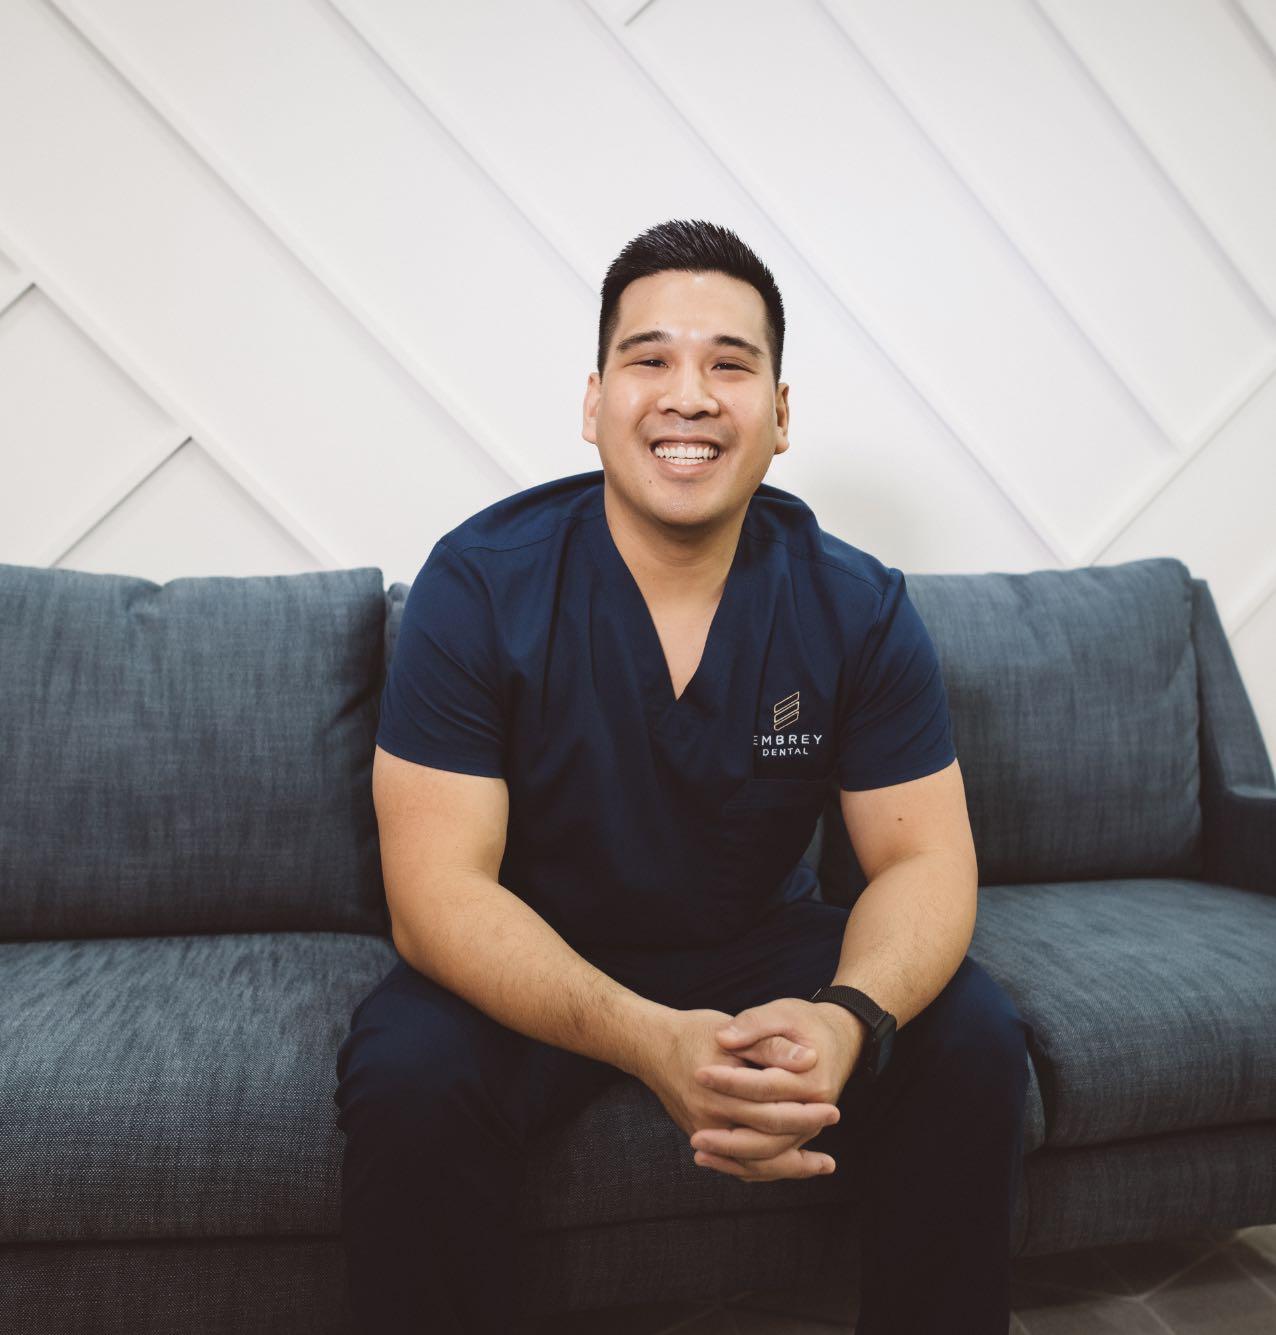 Photo of Royersford Pennsylvania dentist, Dr. Peter Lim